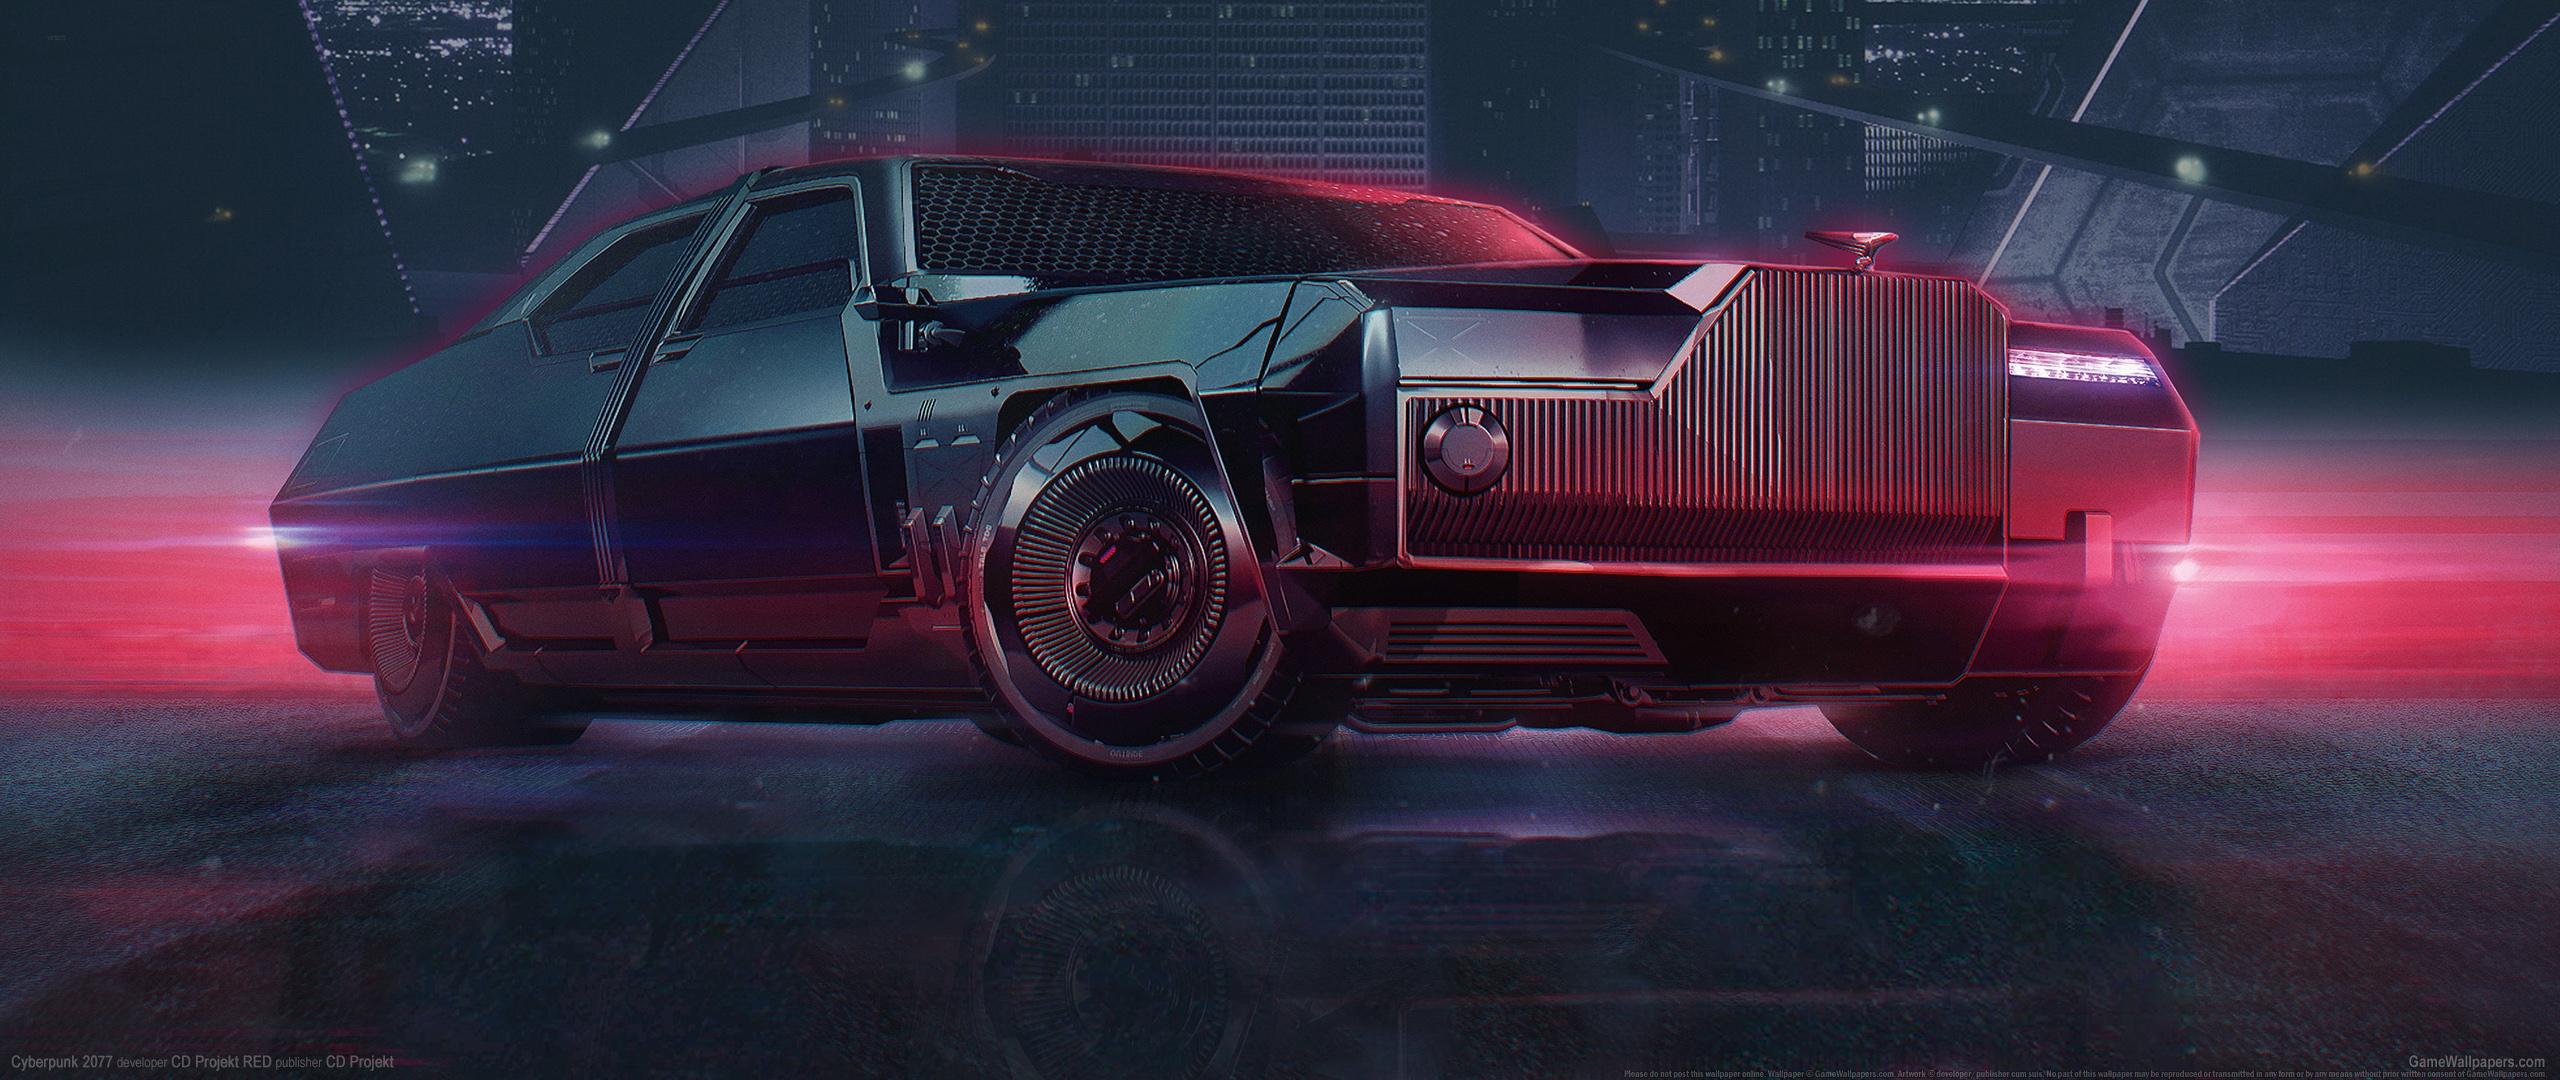 Cyberpunk 2077 2560x1080 fond d'écran 26